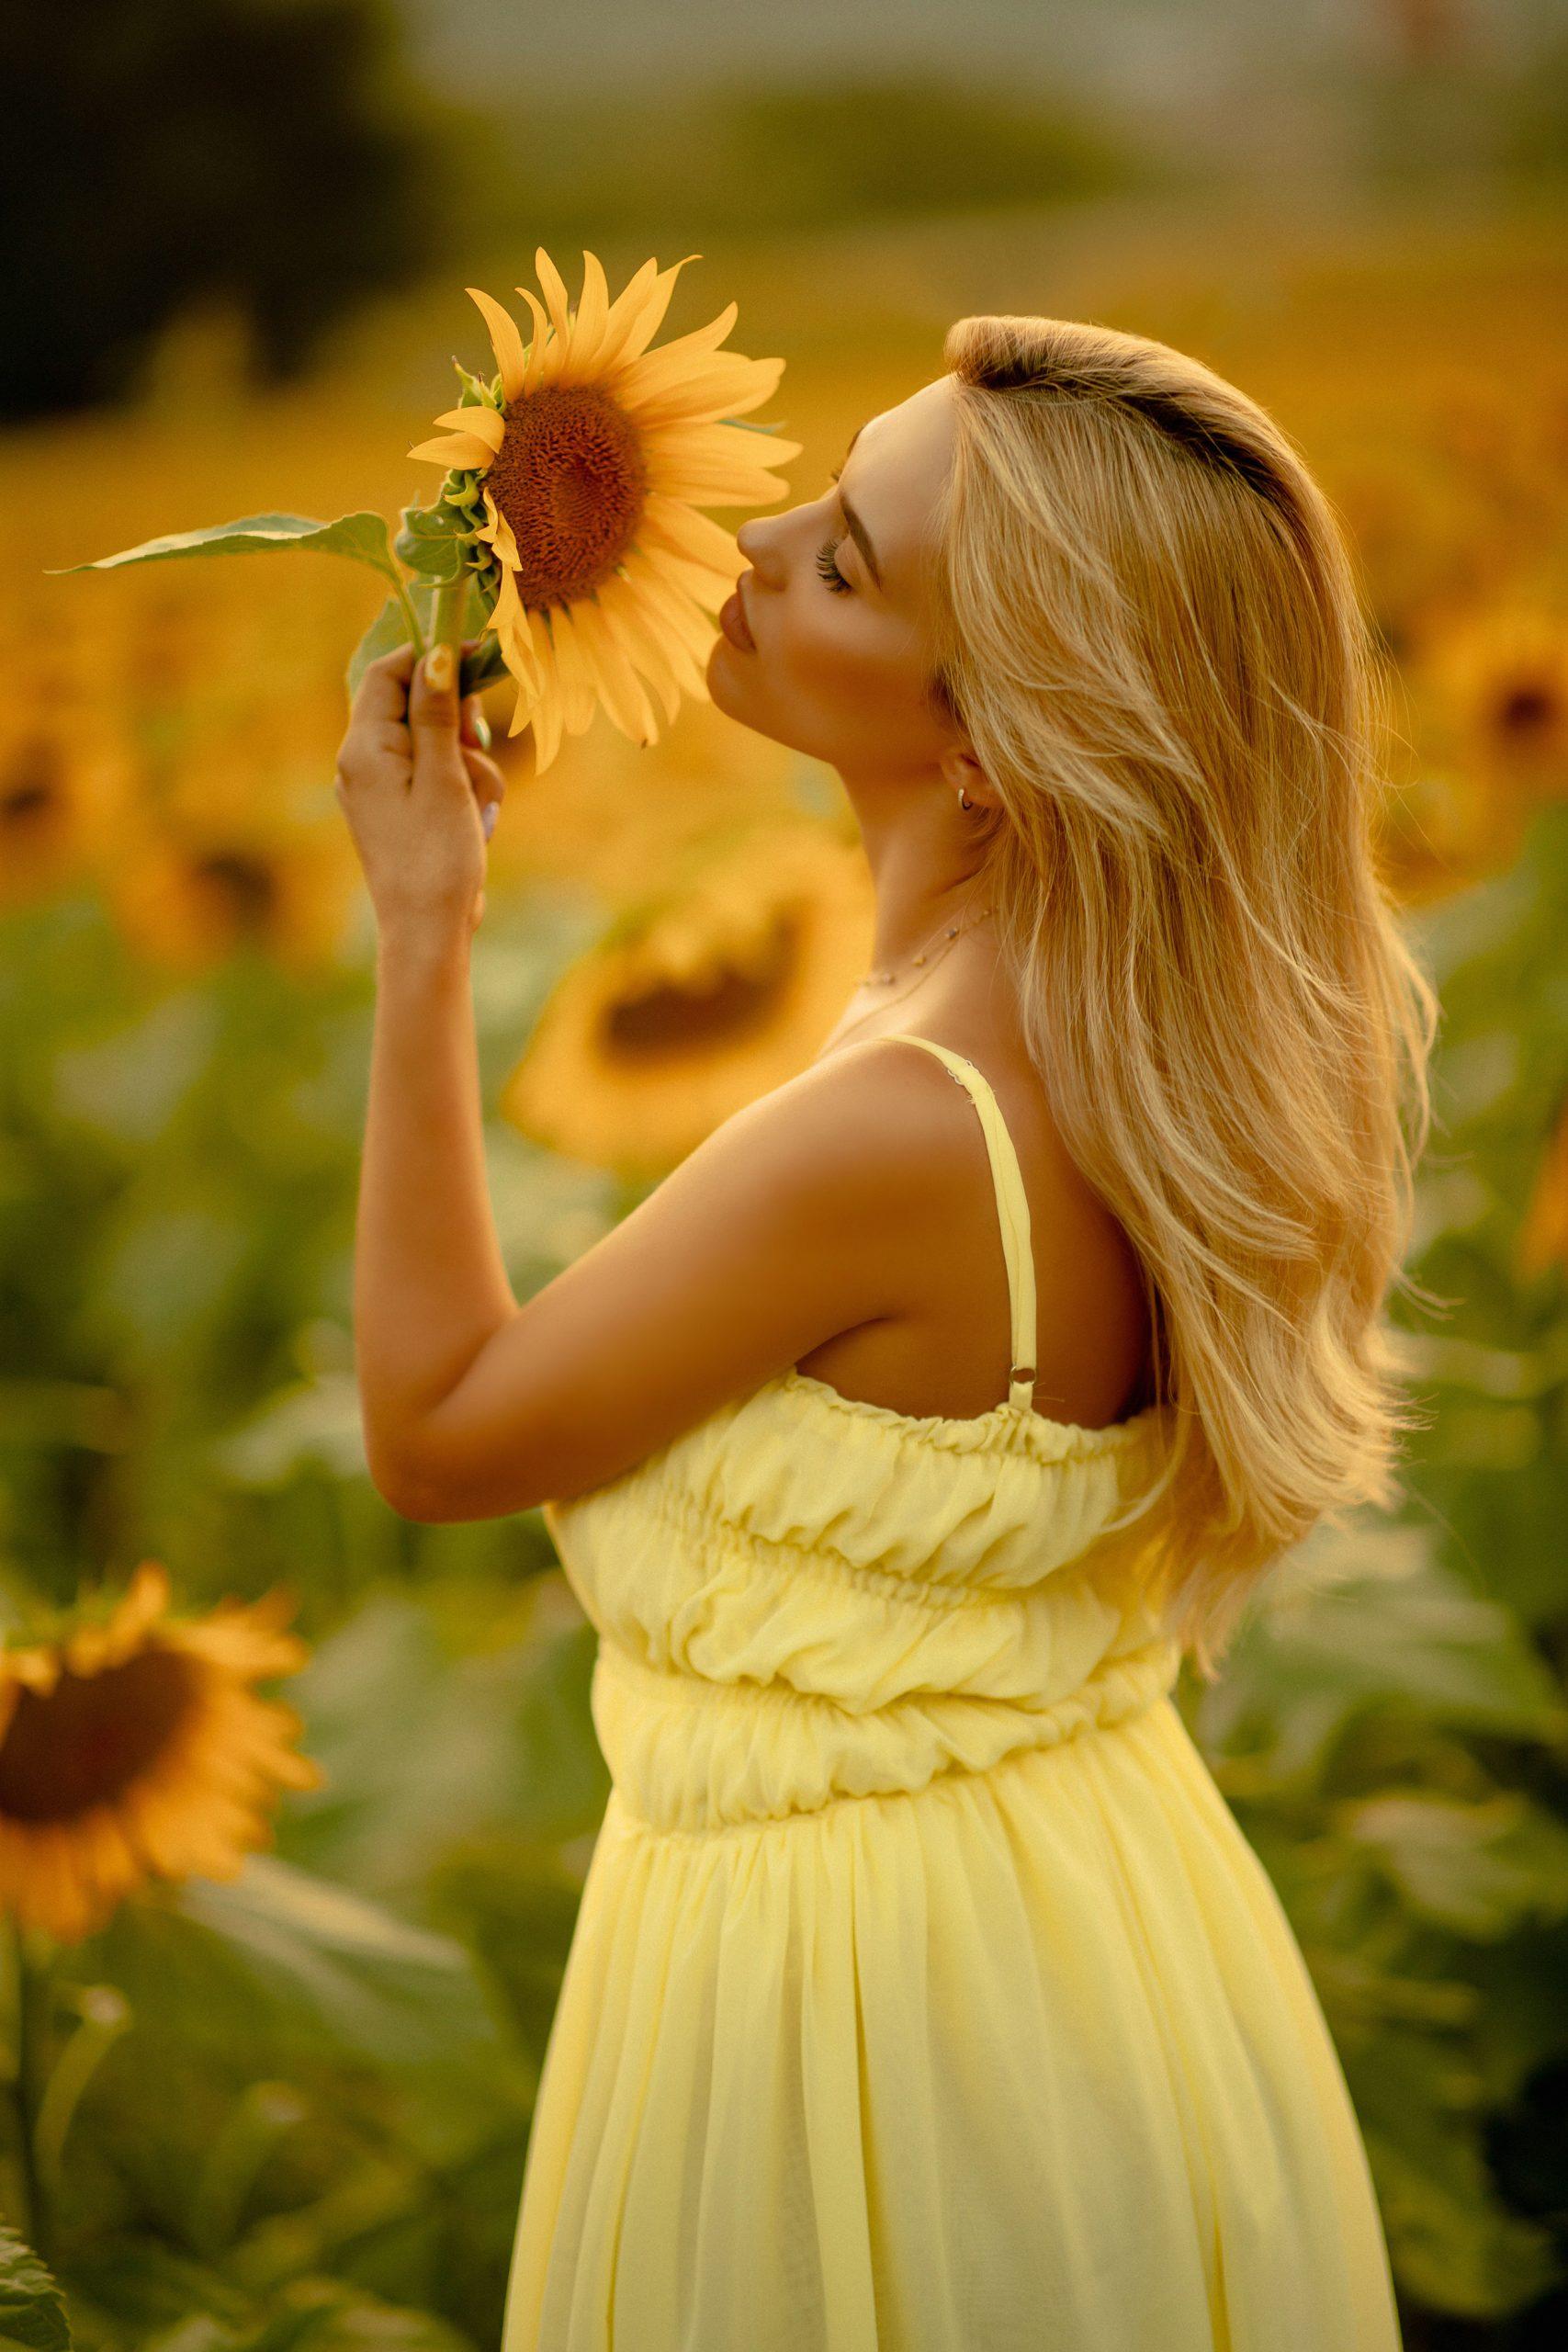 Blonde girl smelling the sunflower